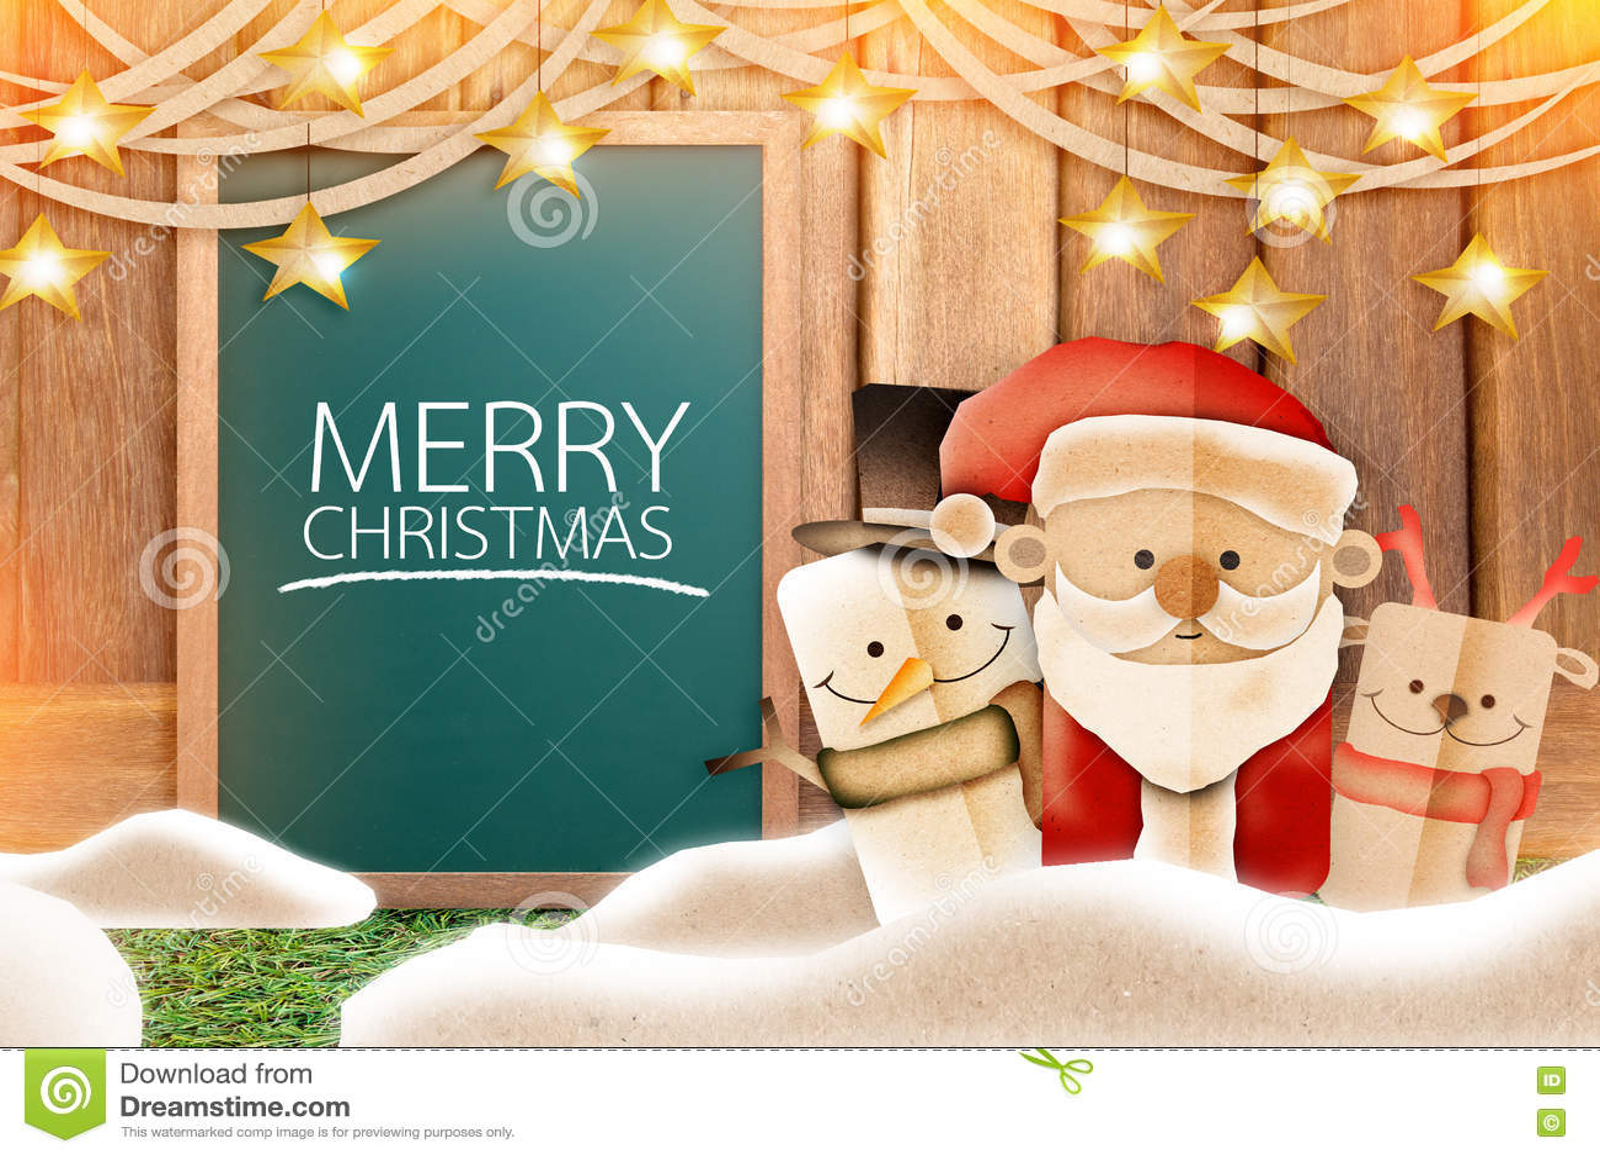 Christmas Celebration Cartoon Images.Xmas Cartoon Paper Cut With Chalkboard Background Stock